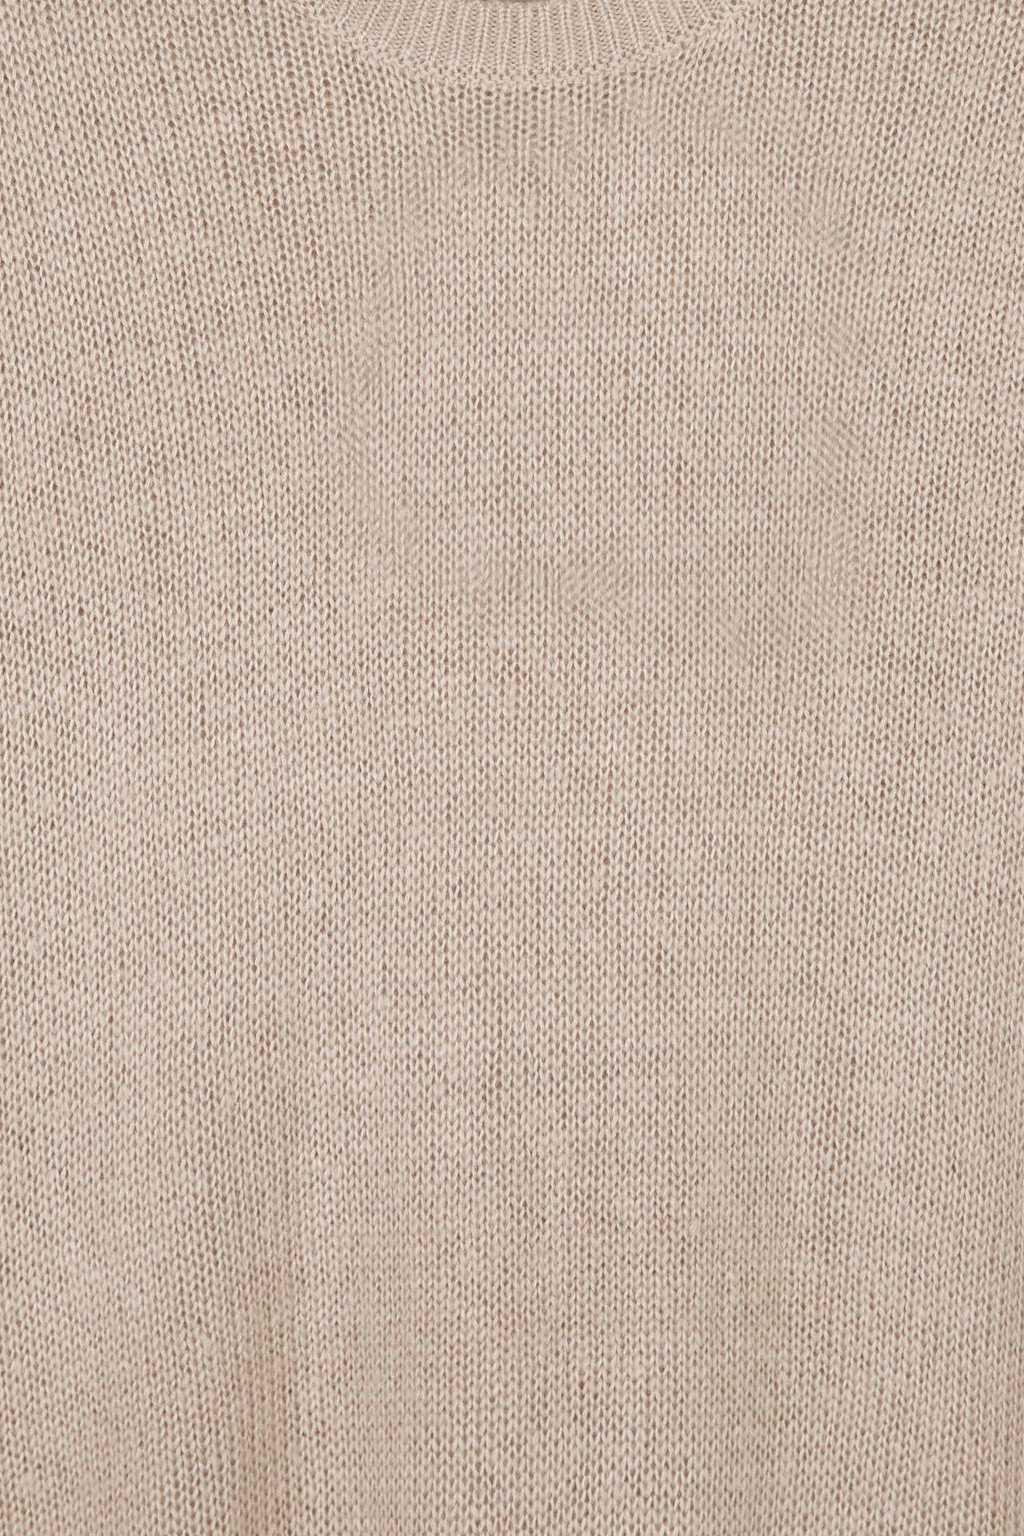 Sweater 3677 Beige 6